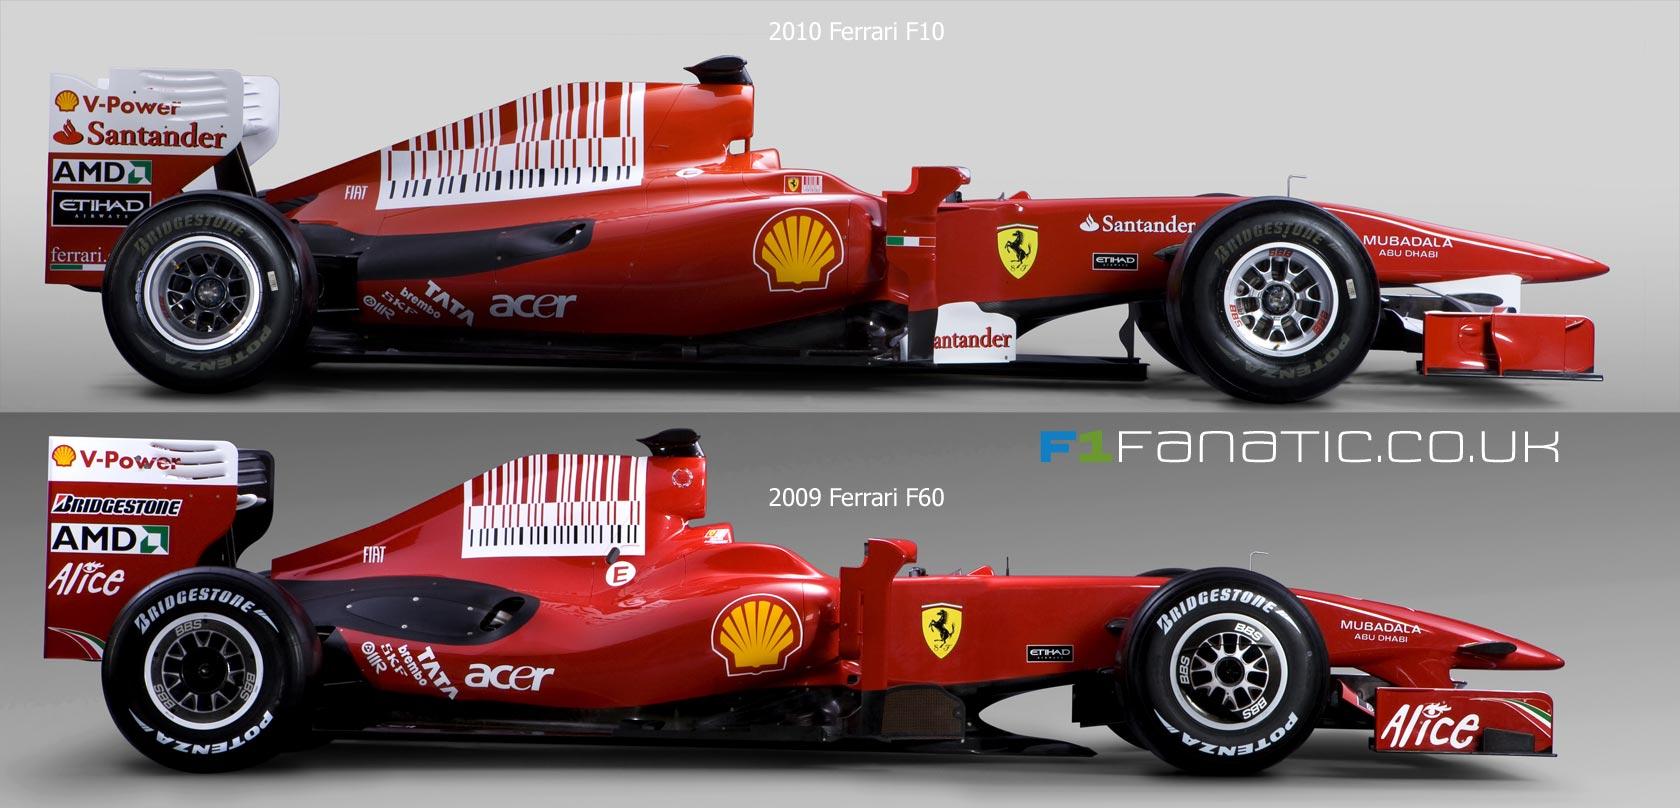 Scuderia Ferrari F10 Launch